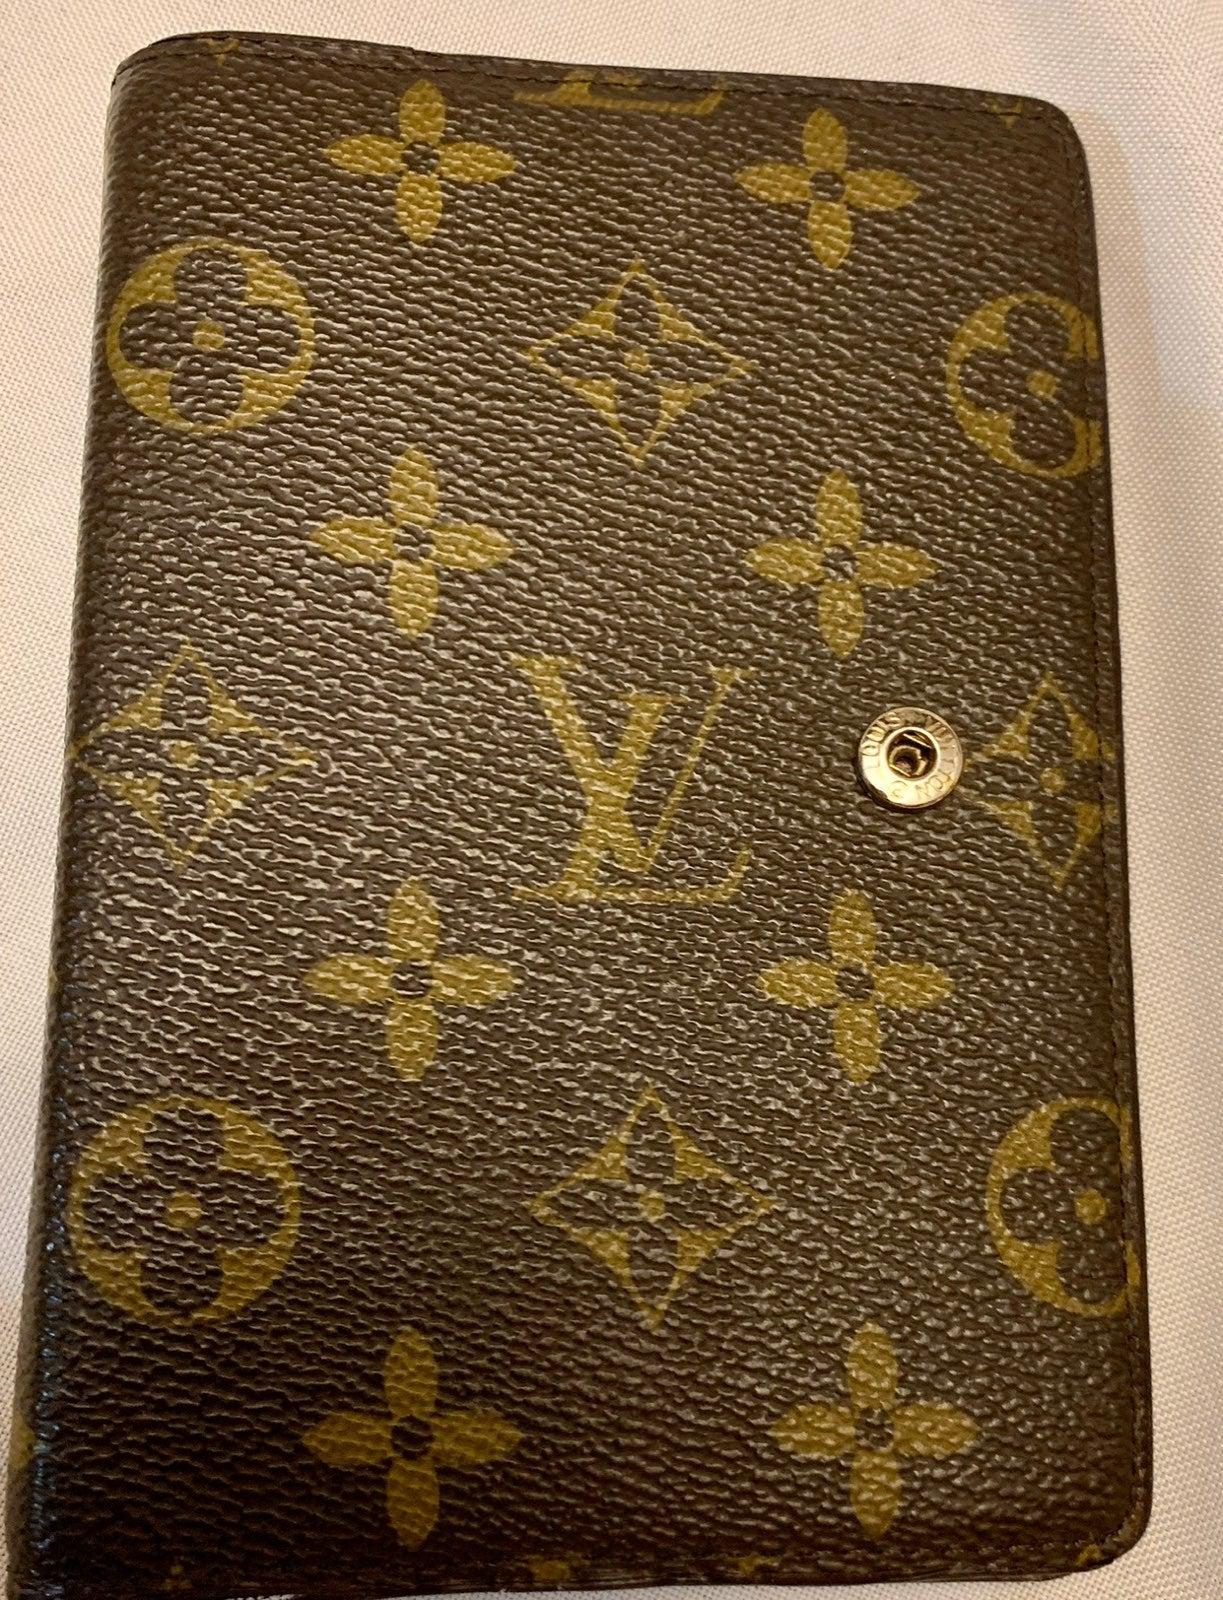 Louis Vuitton Agenda PM DAMAGED